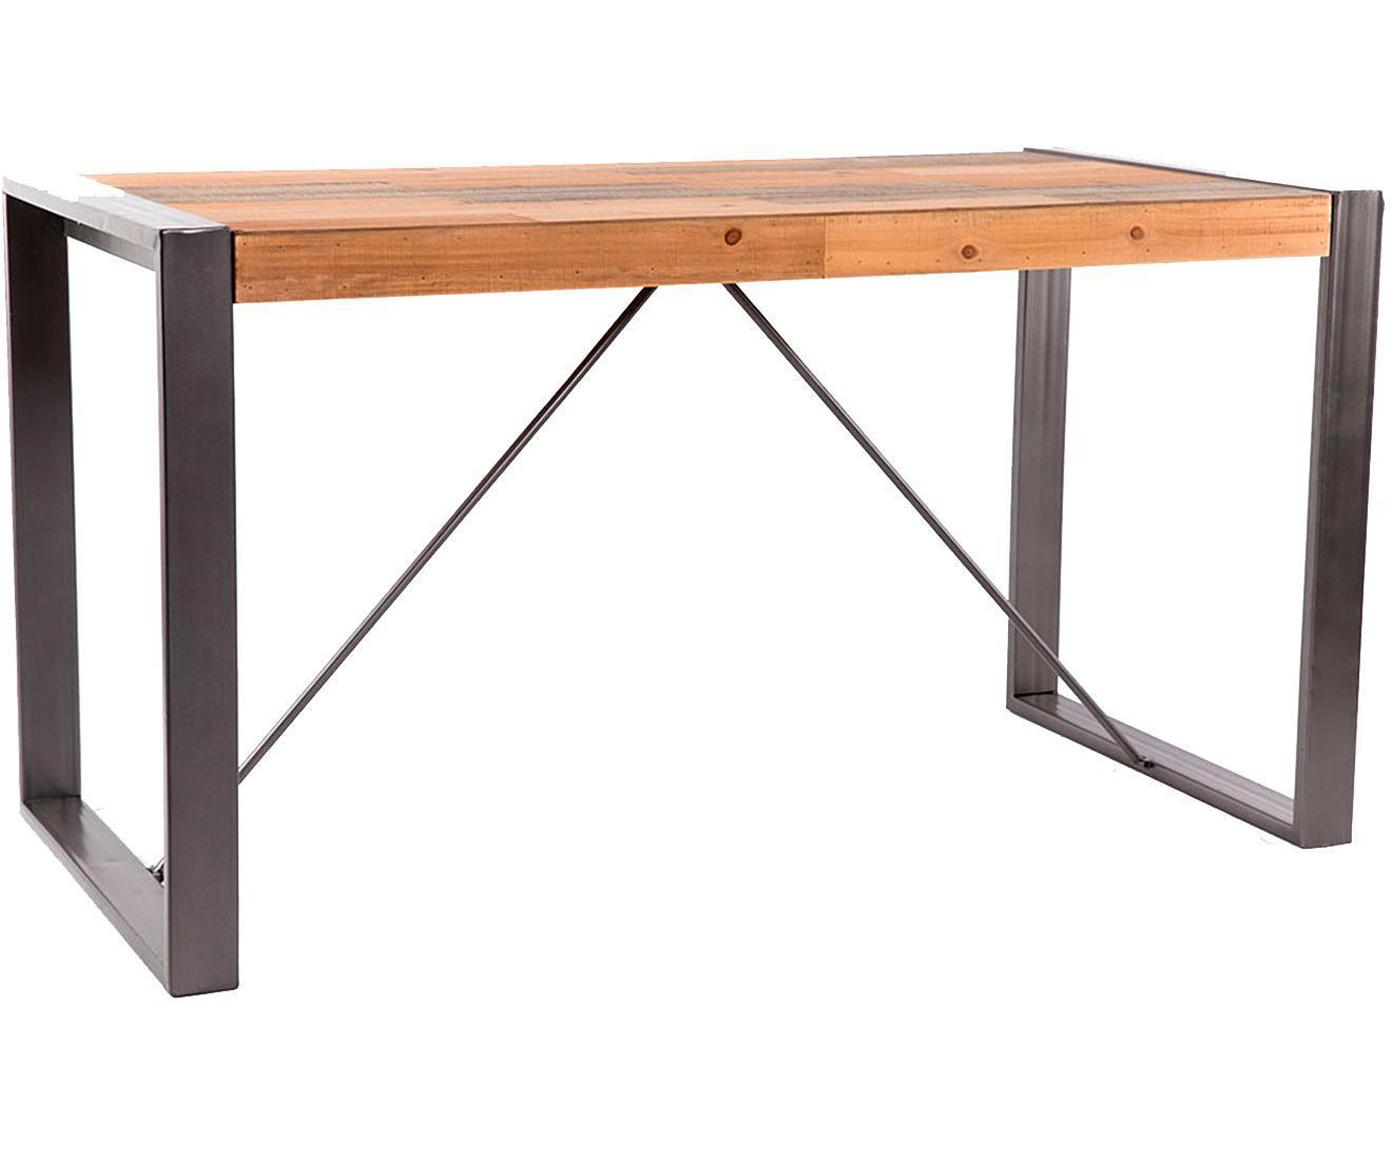 Mesa de comedor Amy, Tablero: tablero de fibras de dens, Patas: hierro, Natural, negro, An 140 x F 76 cm